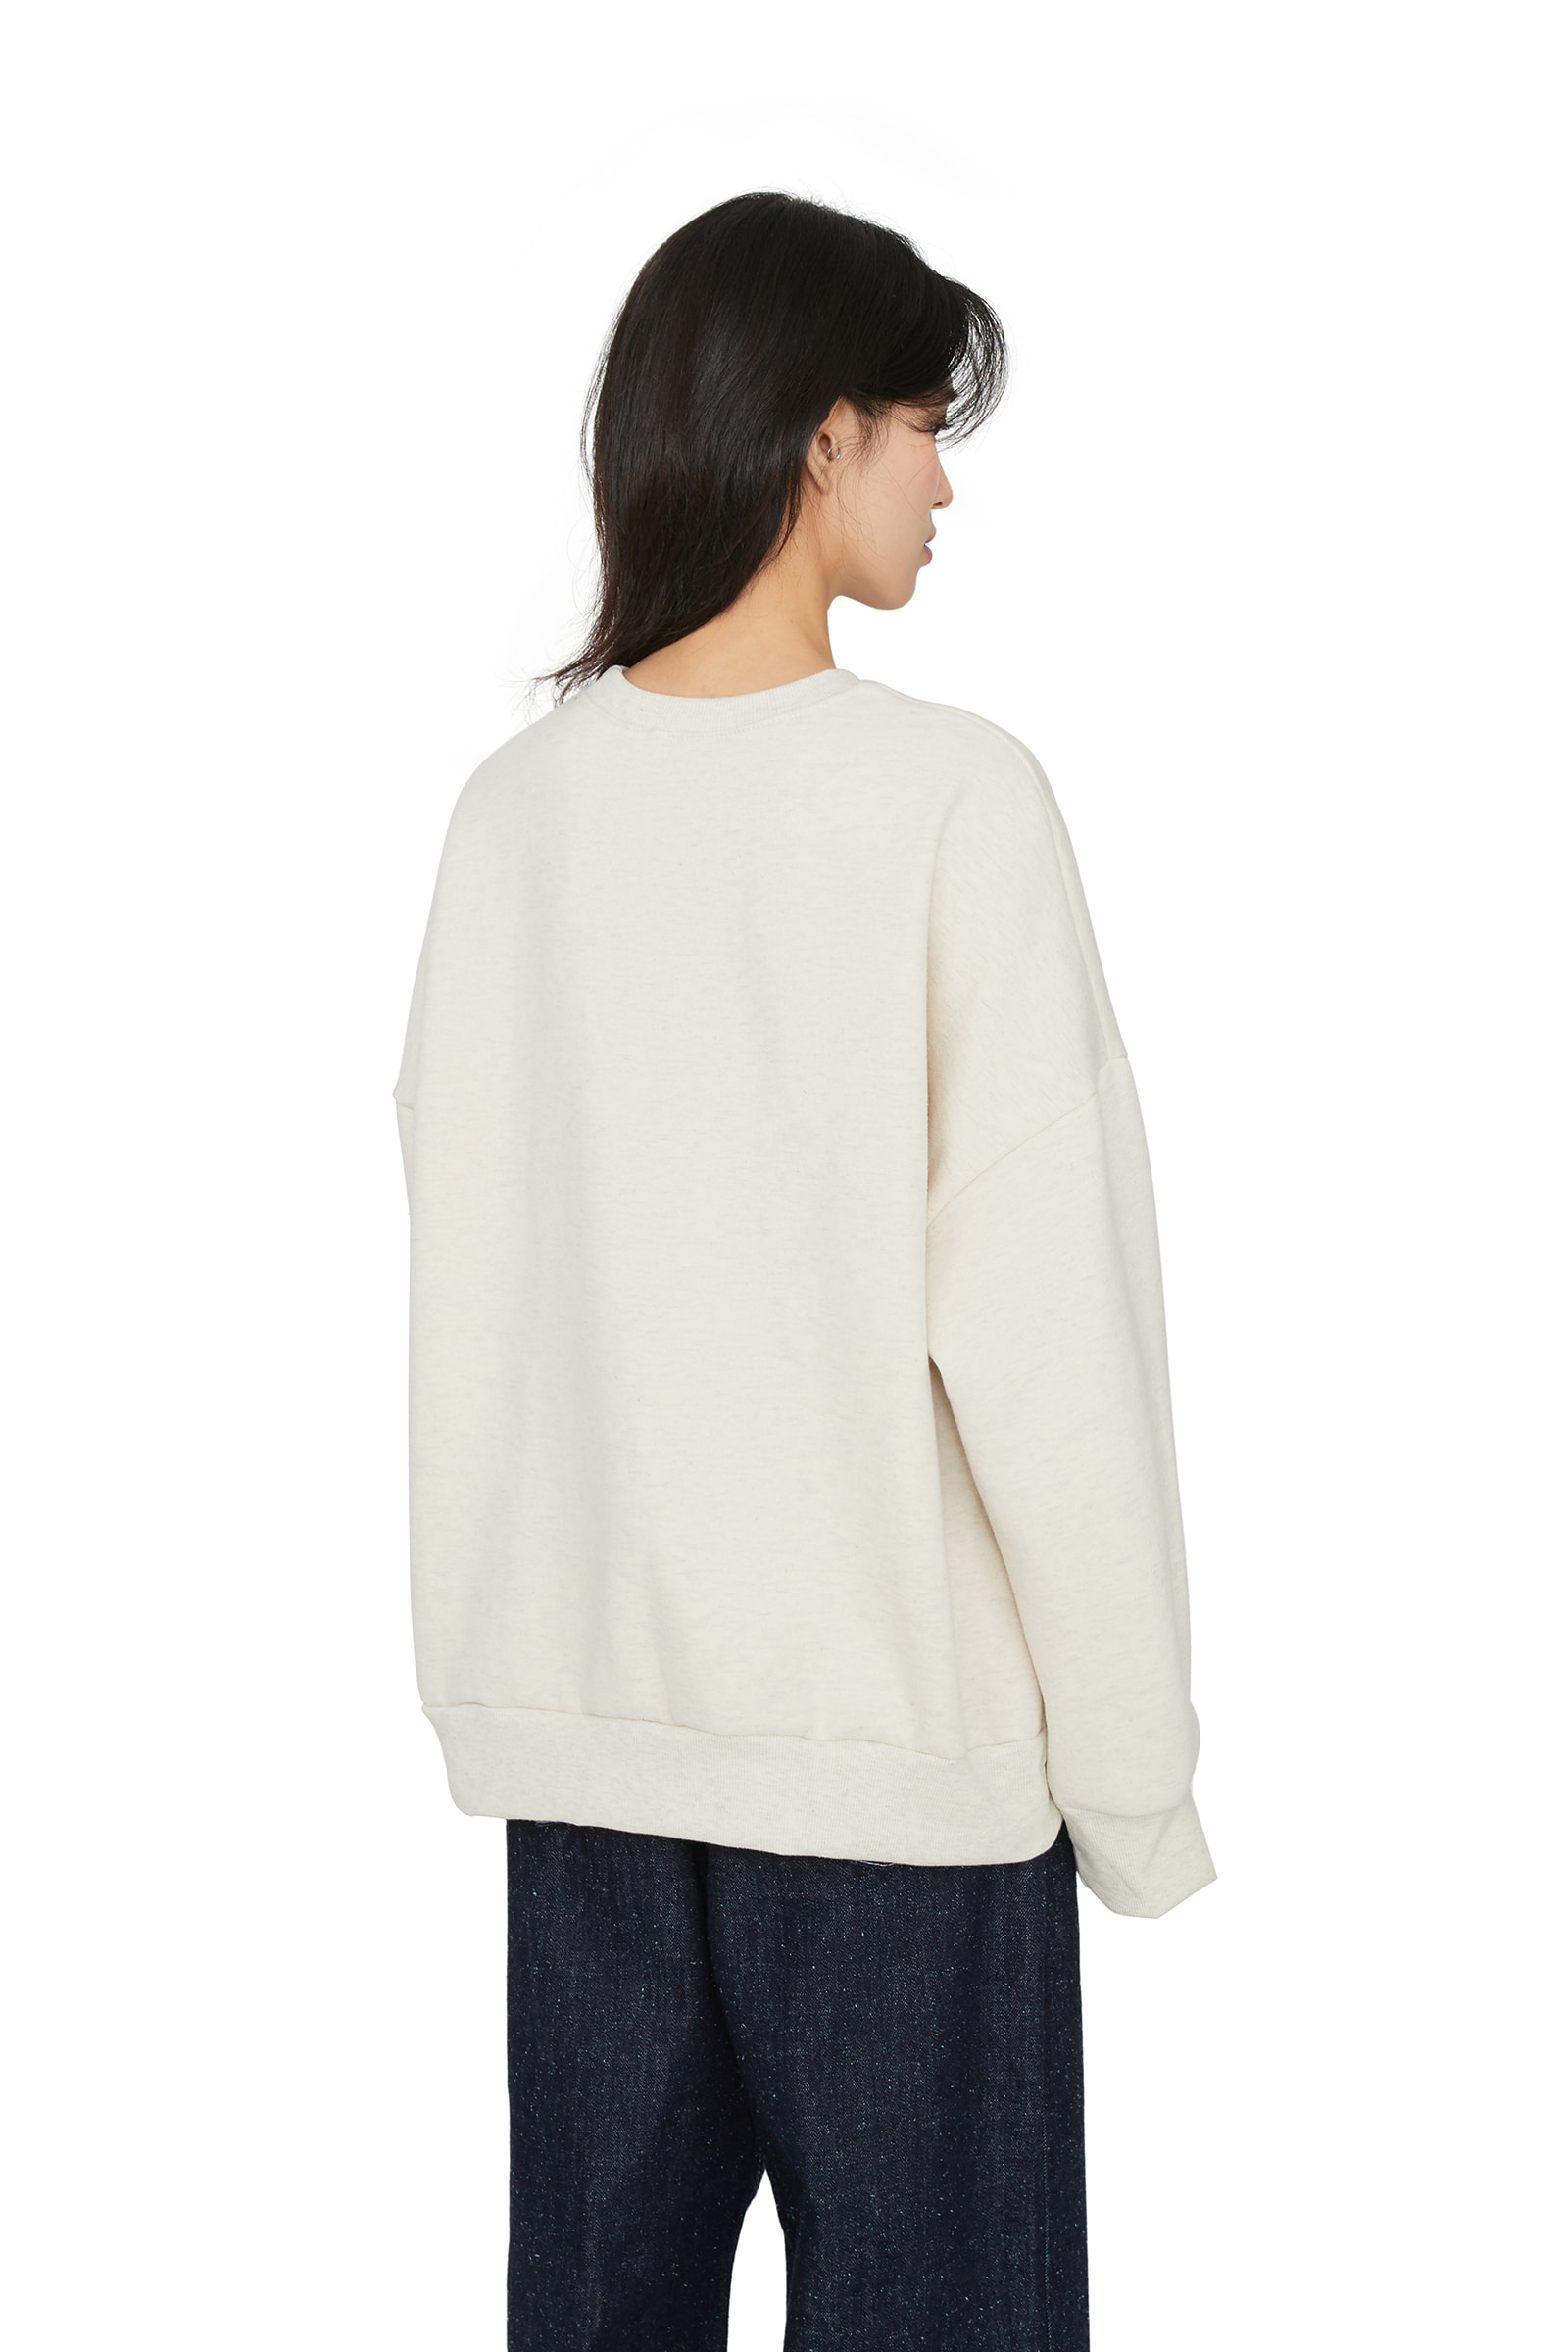 New York brushed crew neck sweatshirt